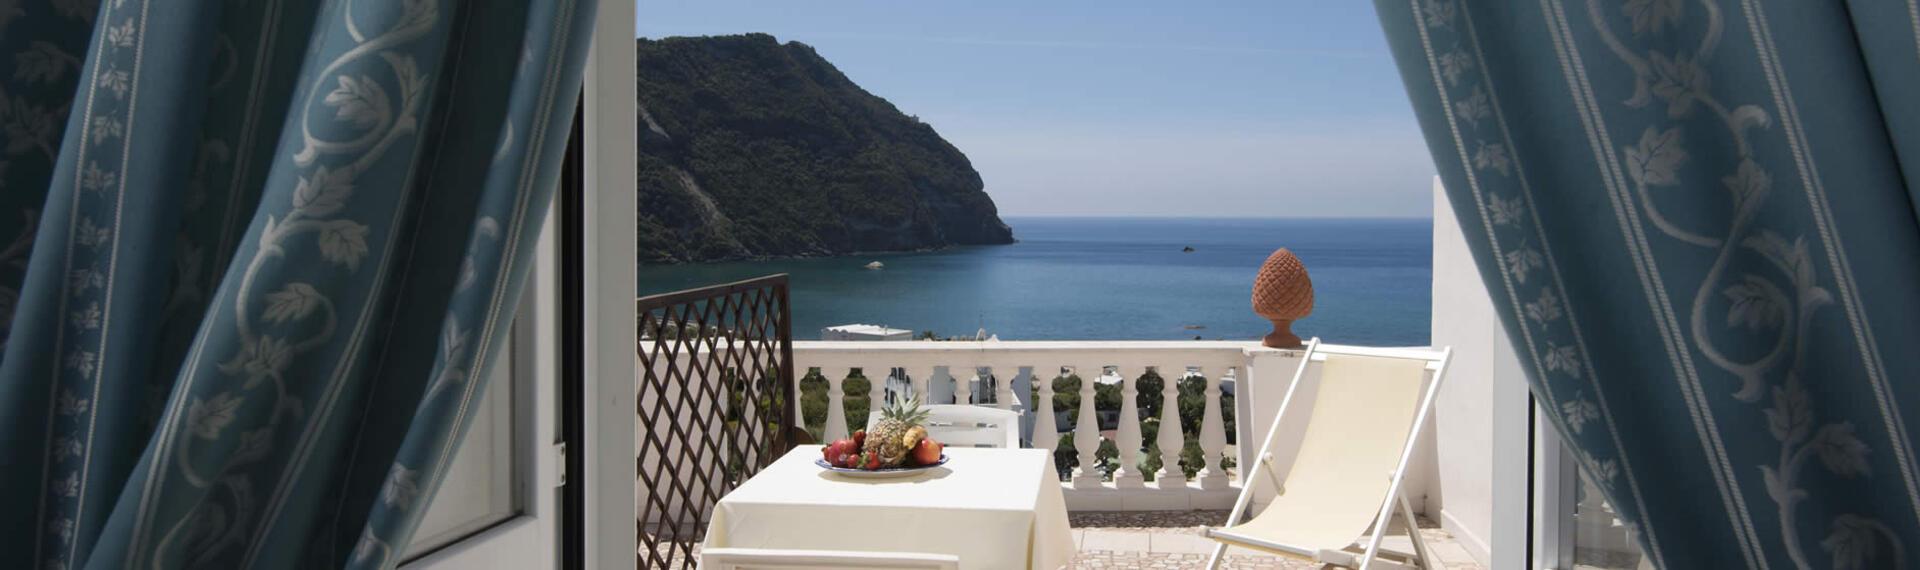 hotelvillabianca en where-we-are-located 010